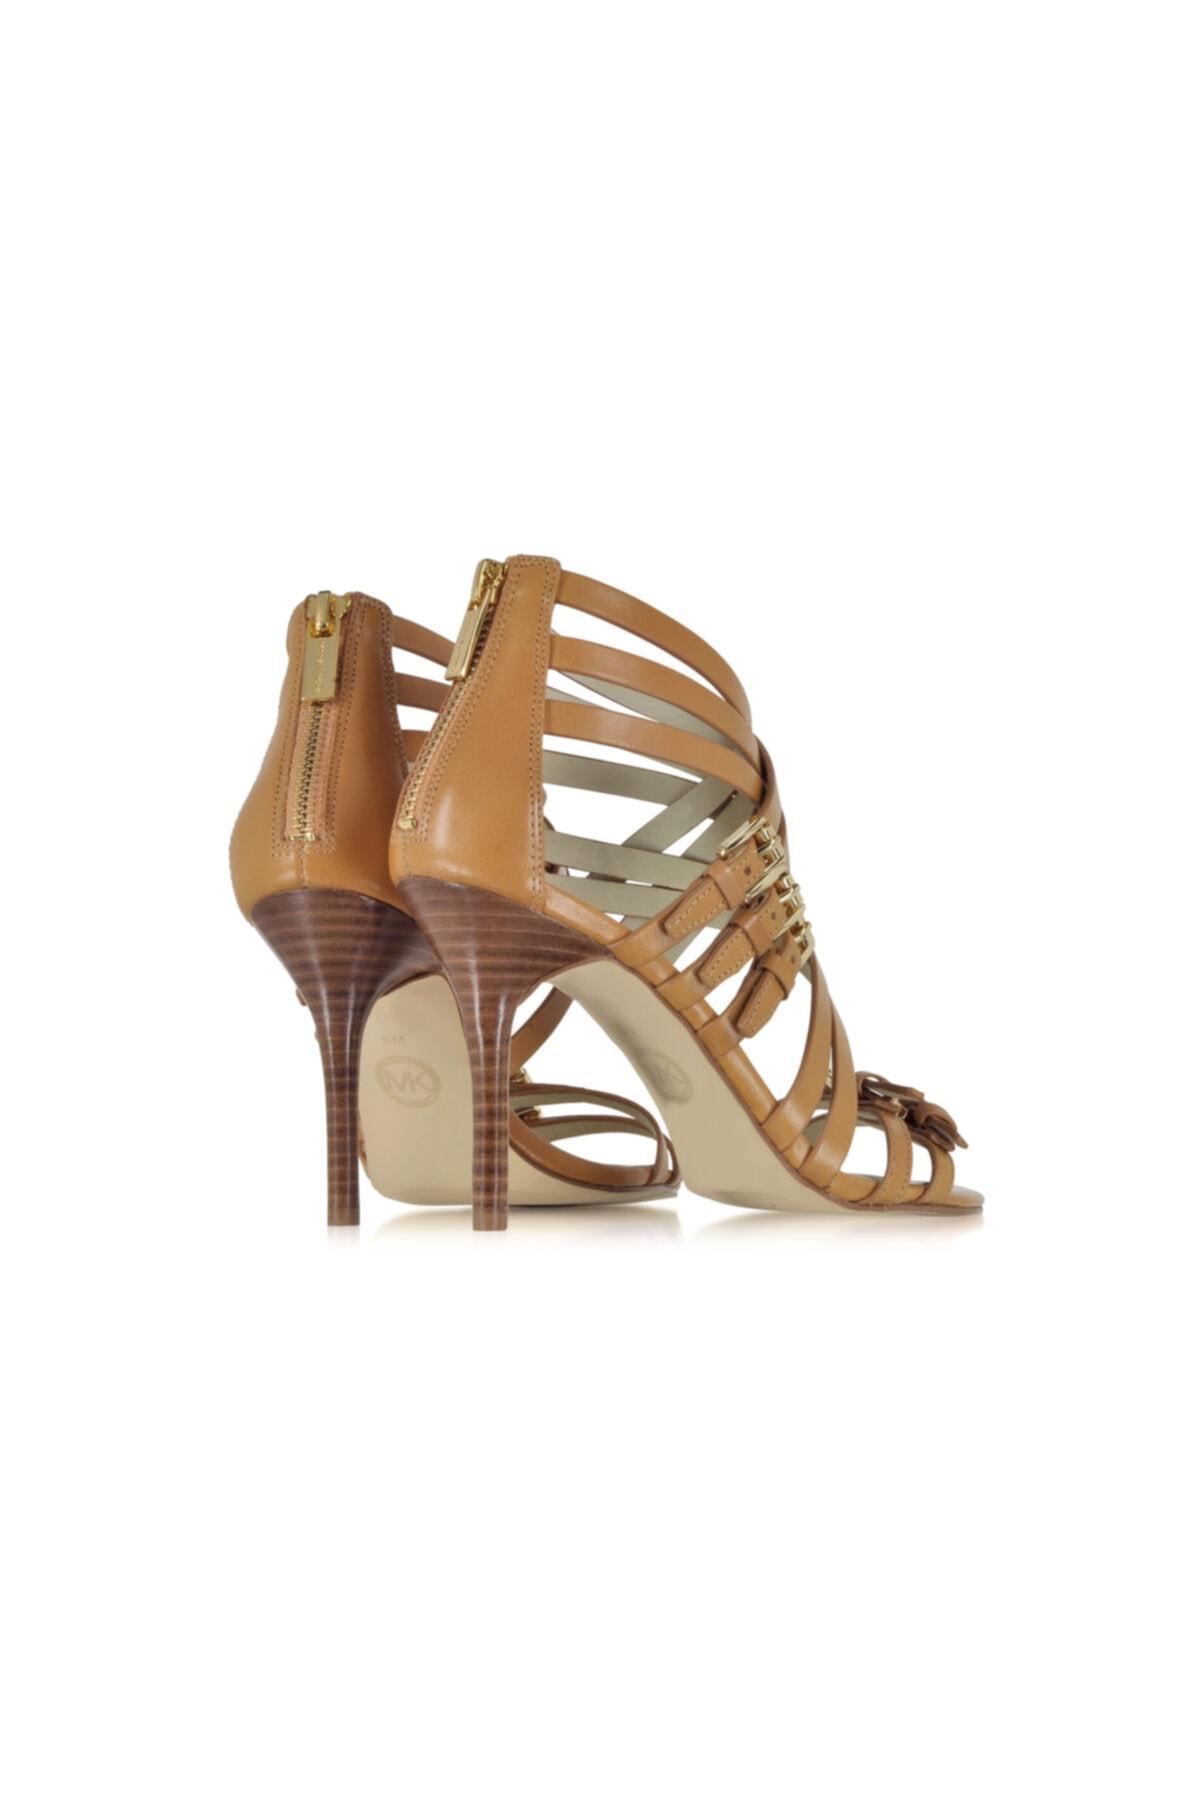 Michael Kors Ava Kadın Topuklu Sandalet Peanut 40s5avhs1l 2